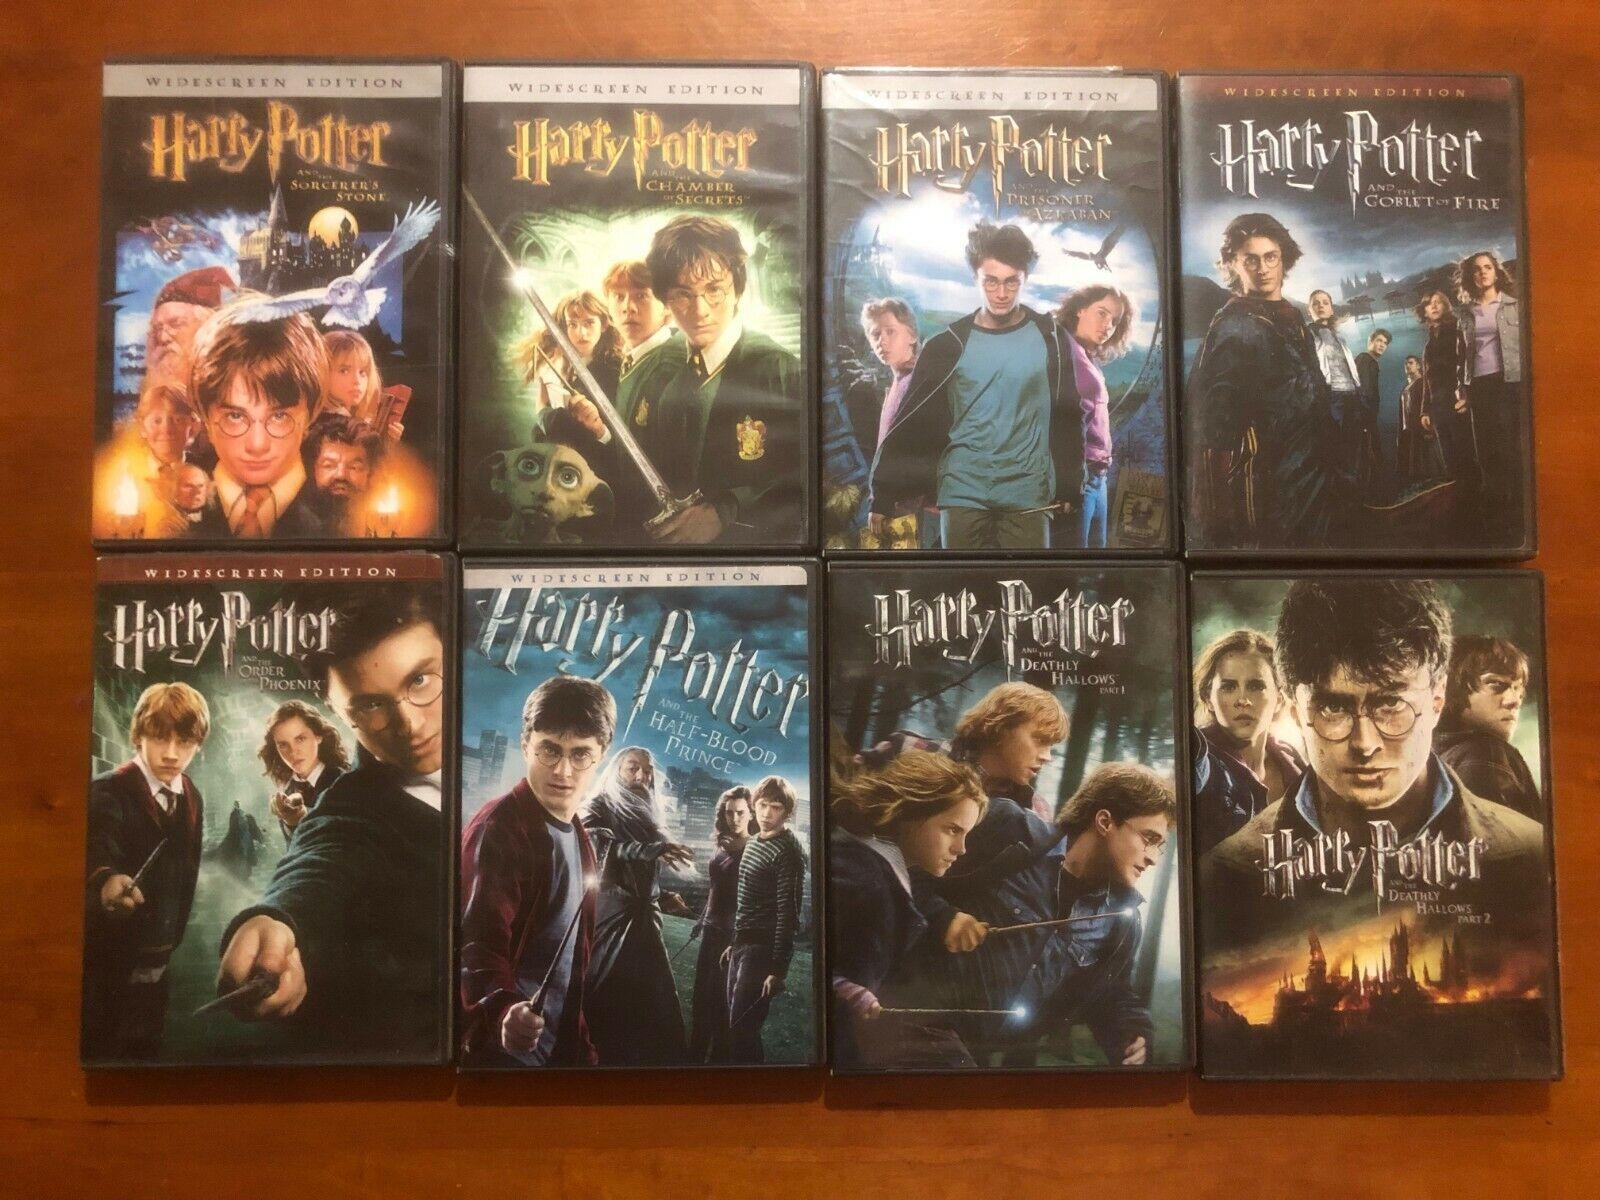 COMPLETE Set of 8 Harry Potter DVDs Wide Screen JK Rowling